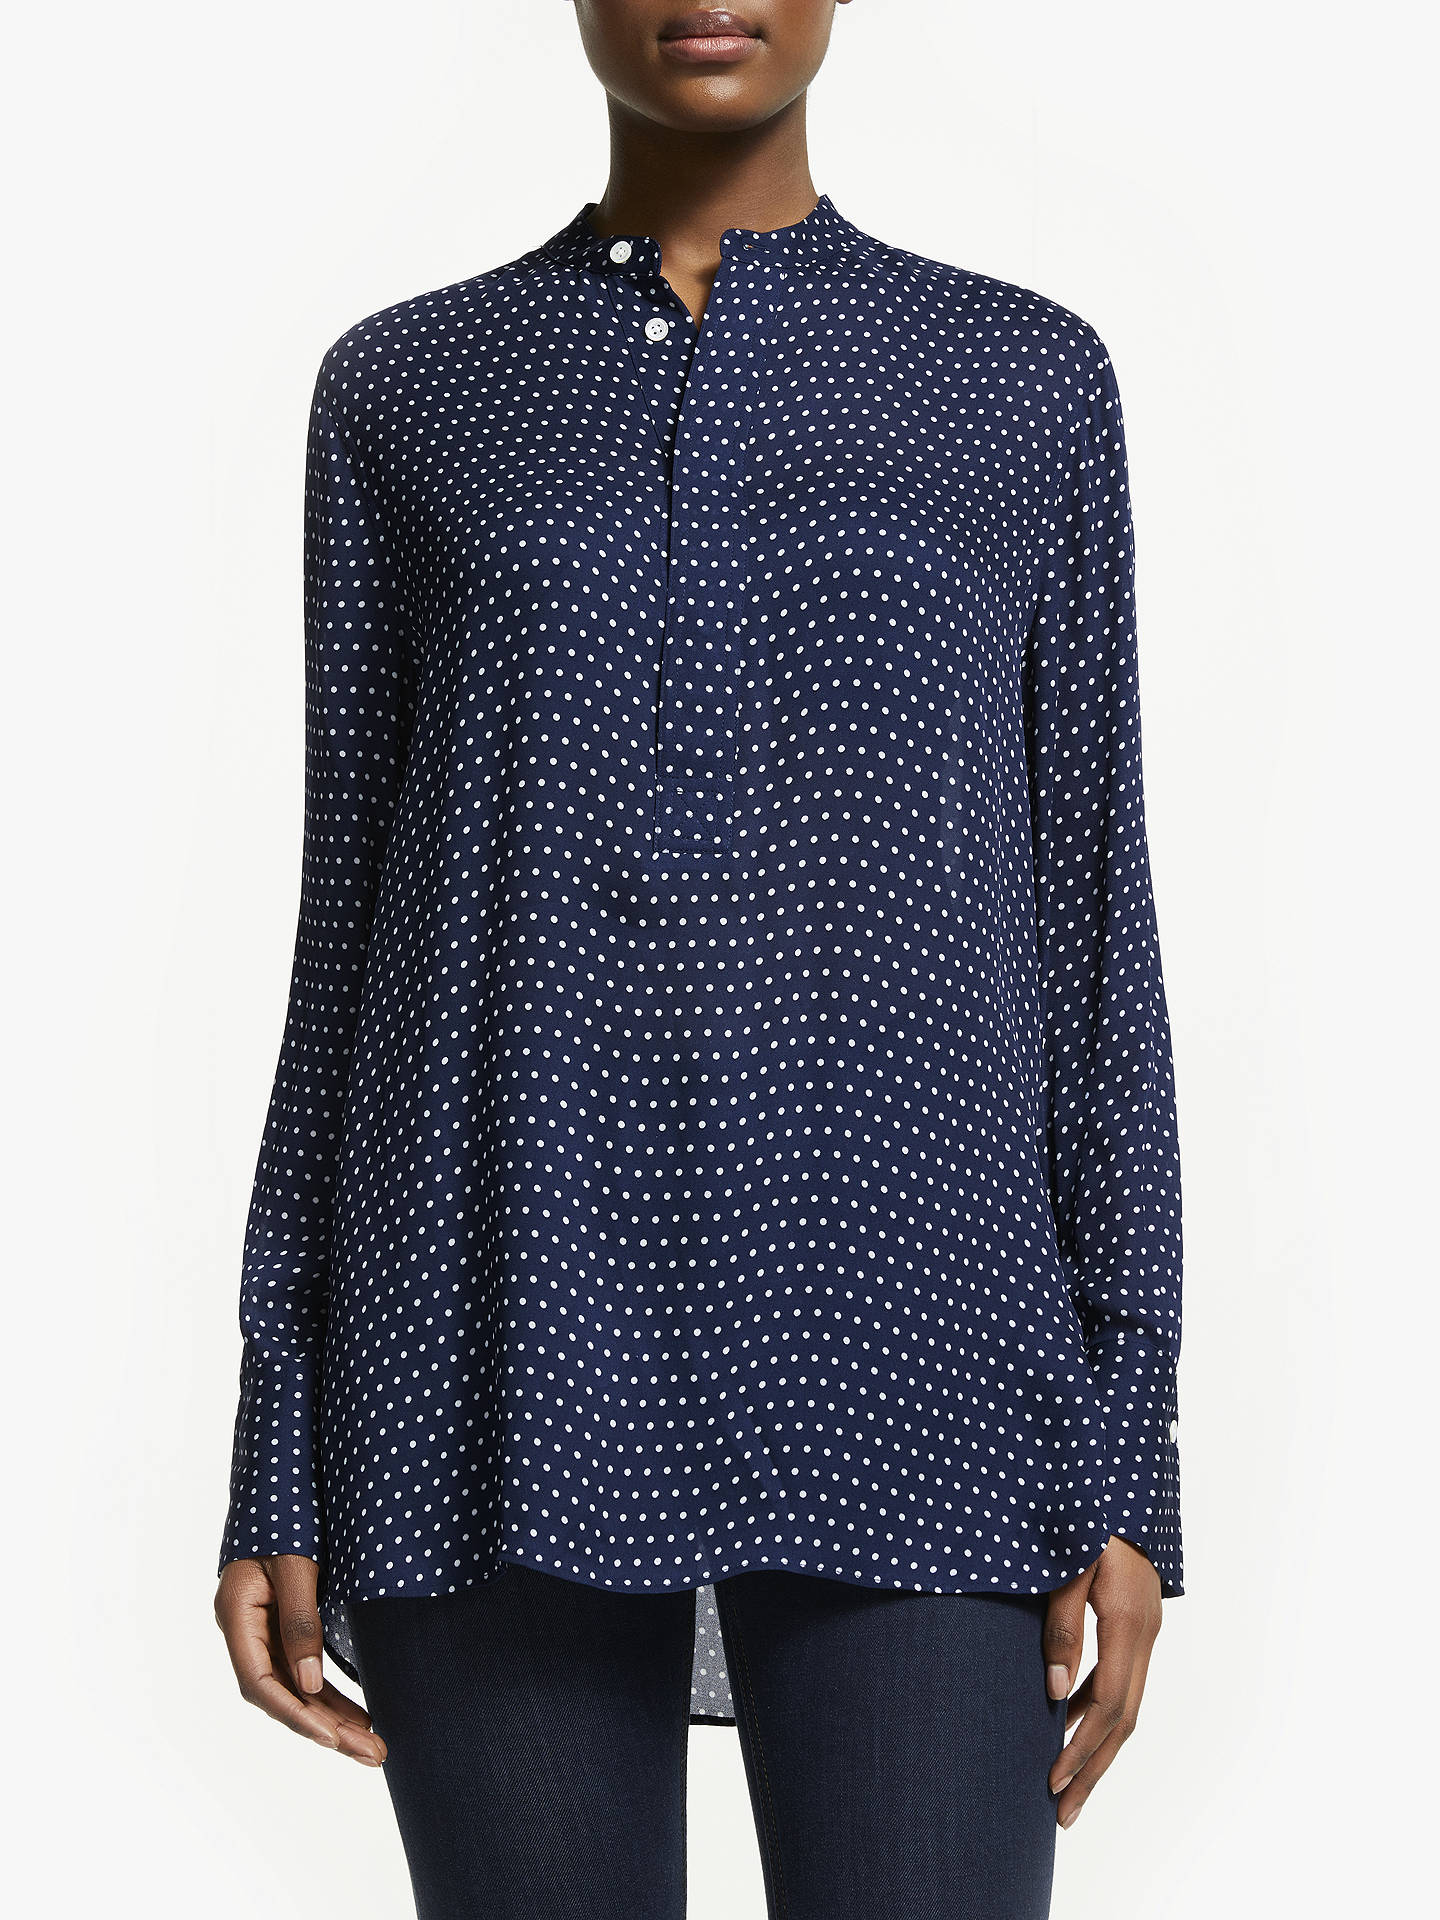 4dbe647f69051 Buy Polo Ralph Lauren Desra Polka Dot Silk Shirt